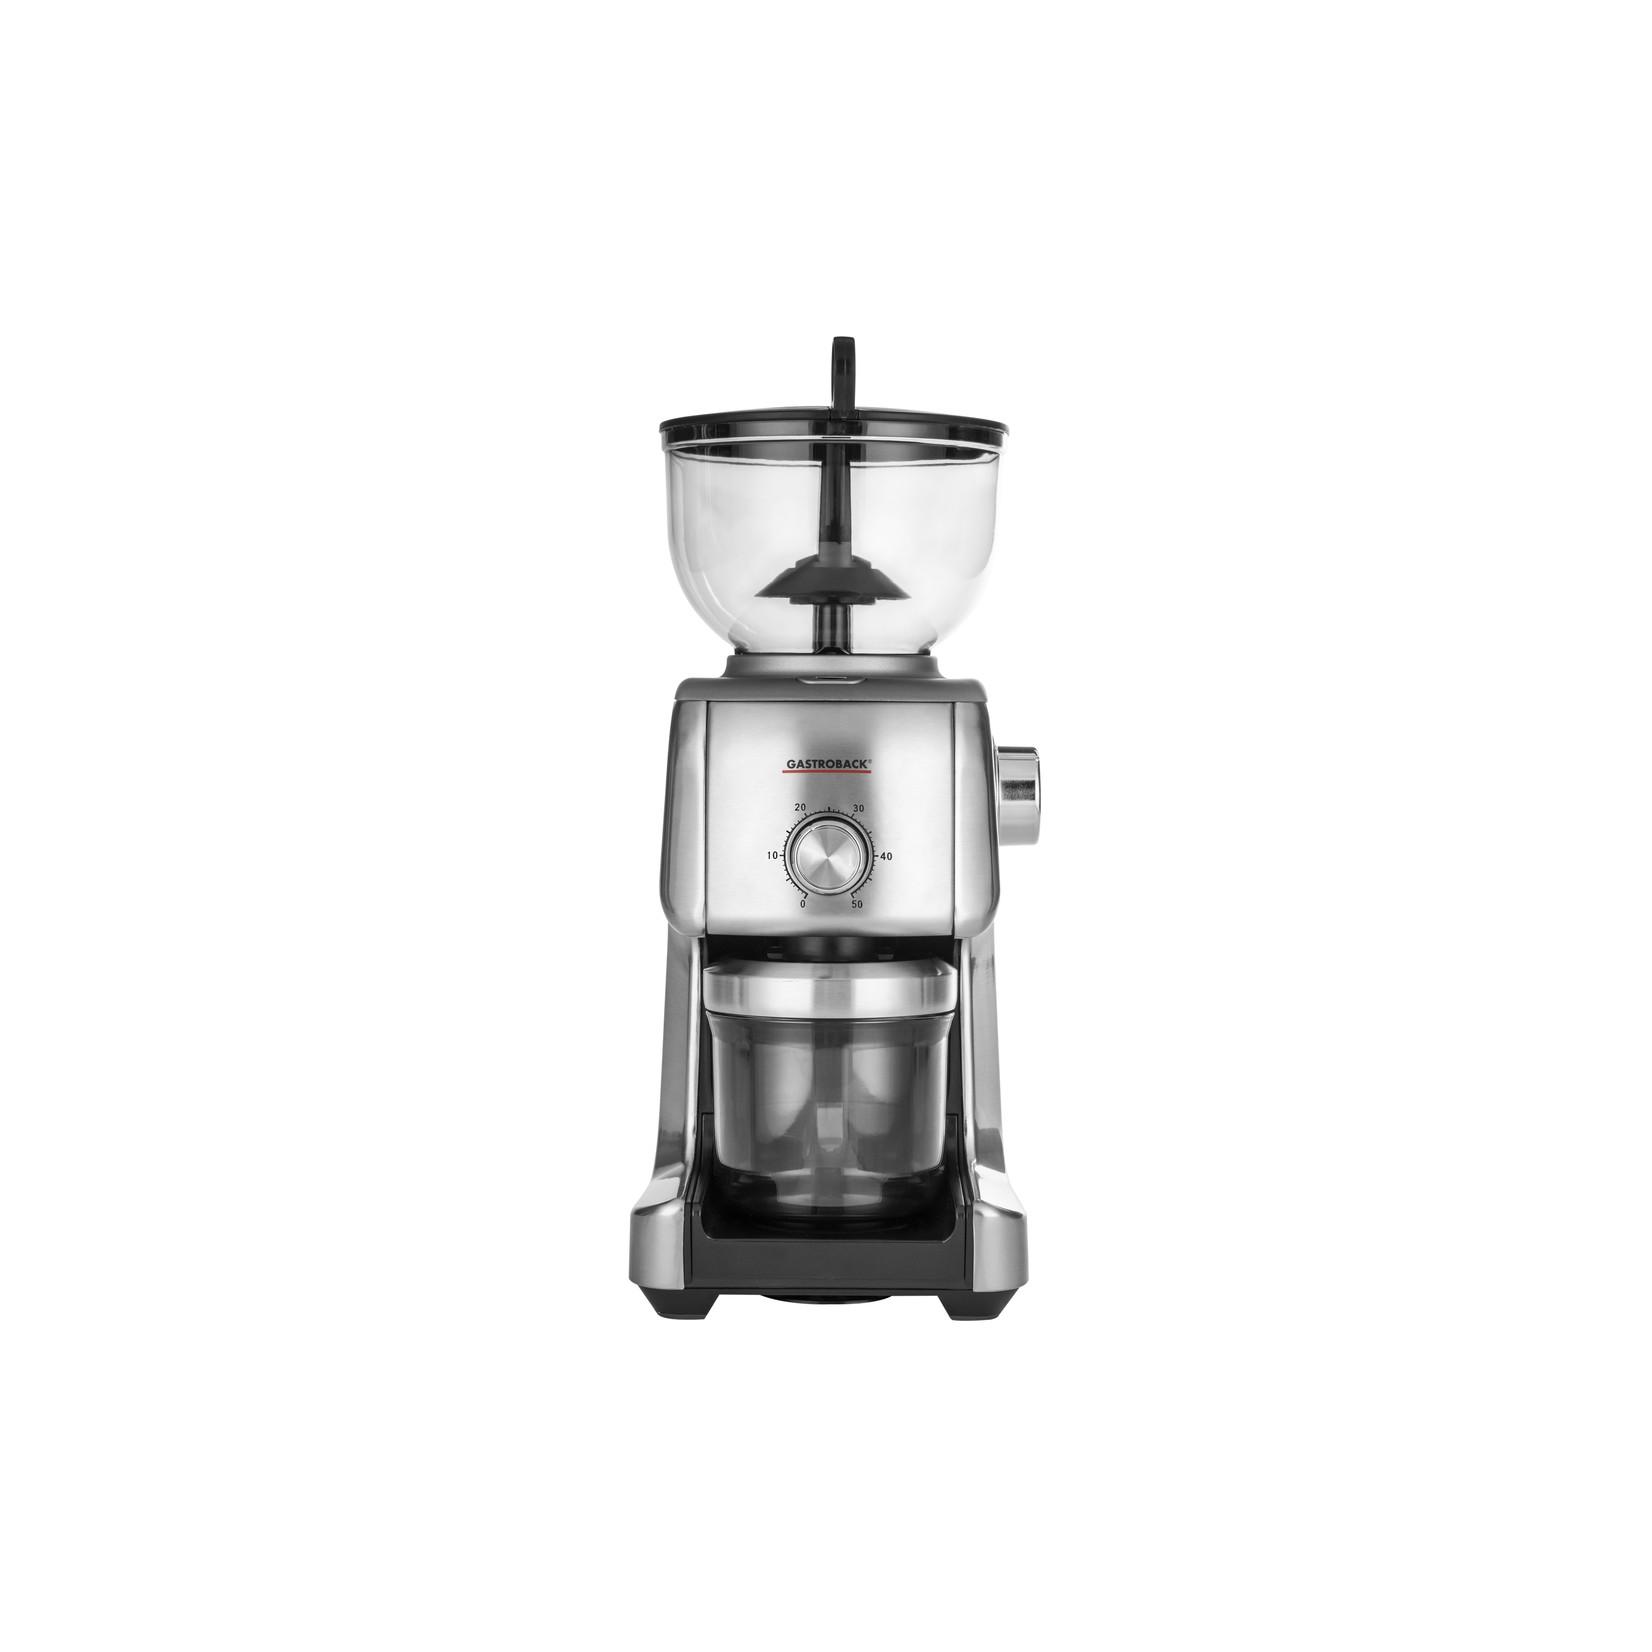 Gastroback Gastroback Koffiemolen 42642